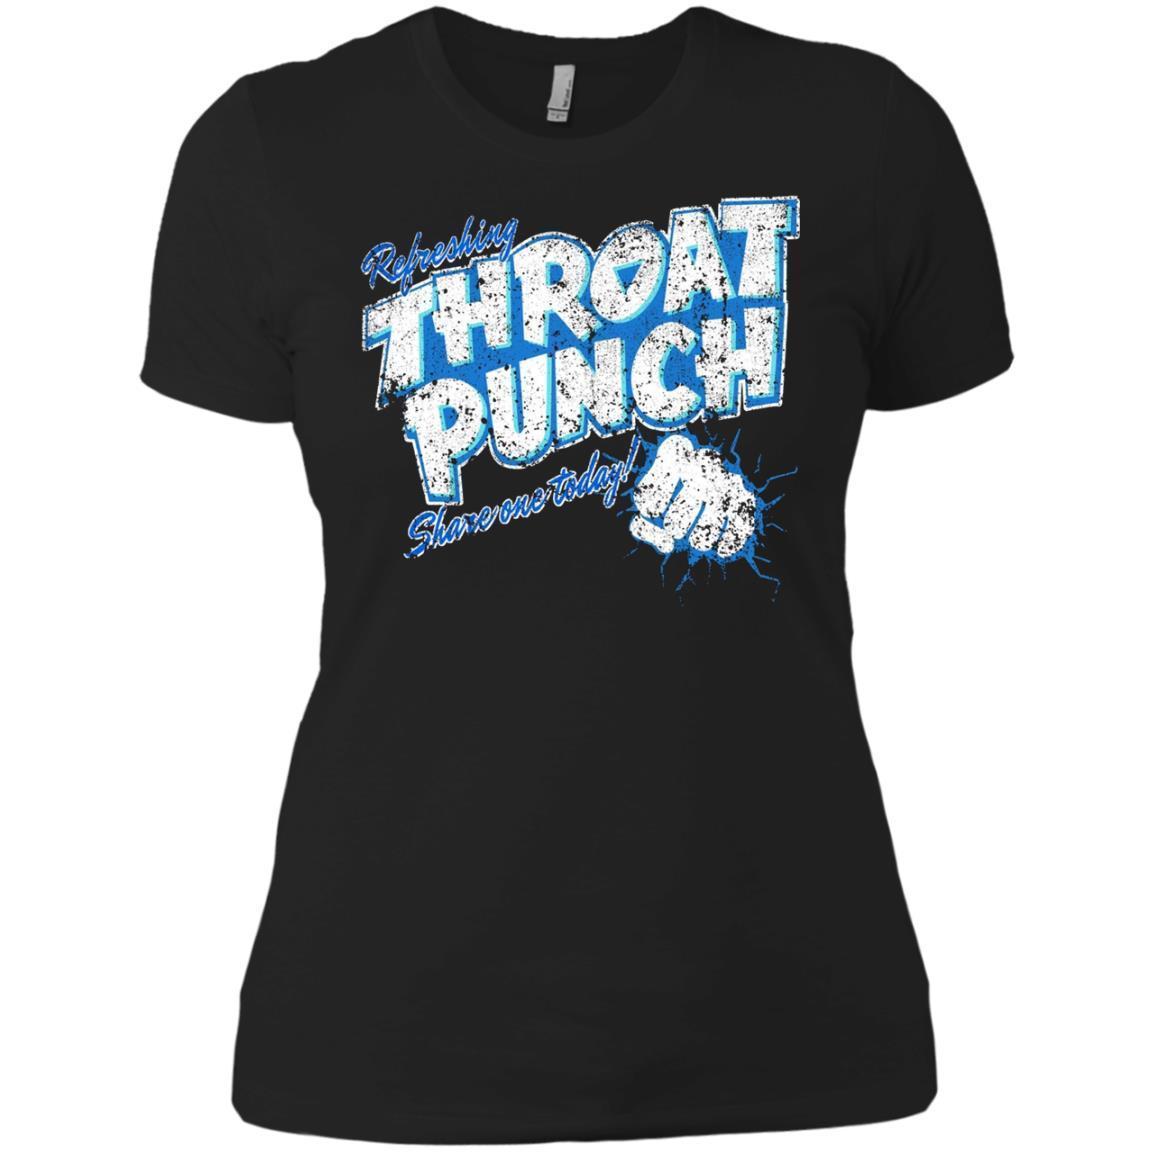 Refreshing Throat Punch Grunge Ladies' Boyfriend T-Shirt